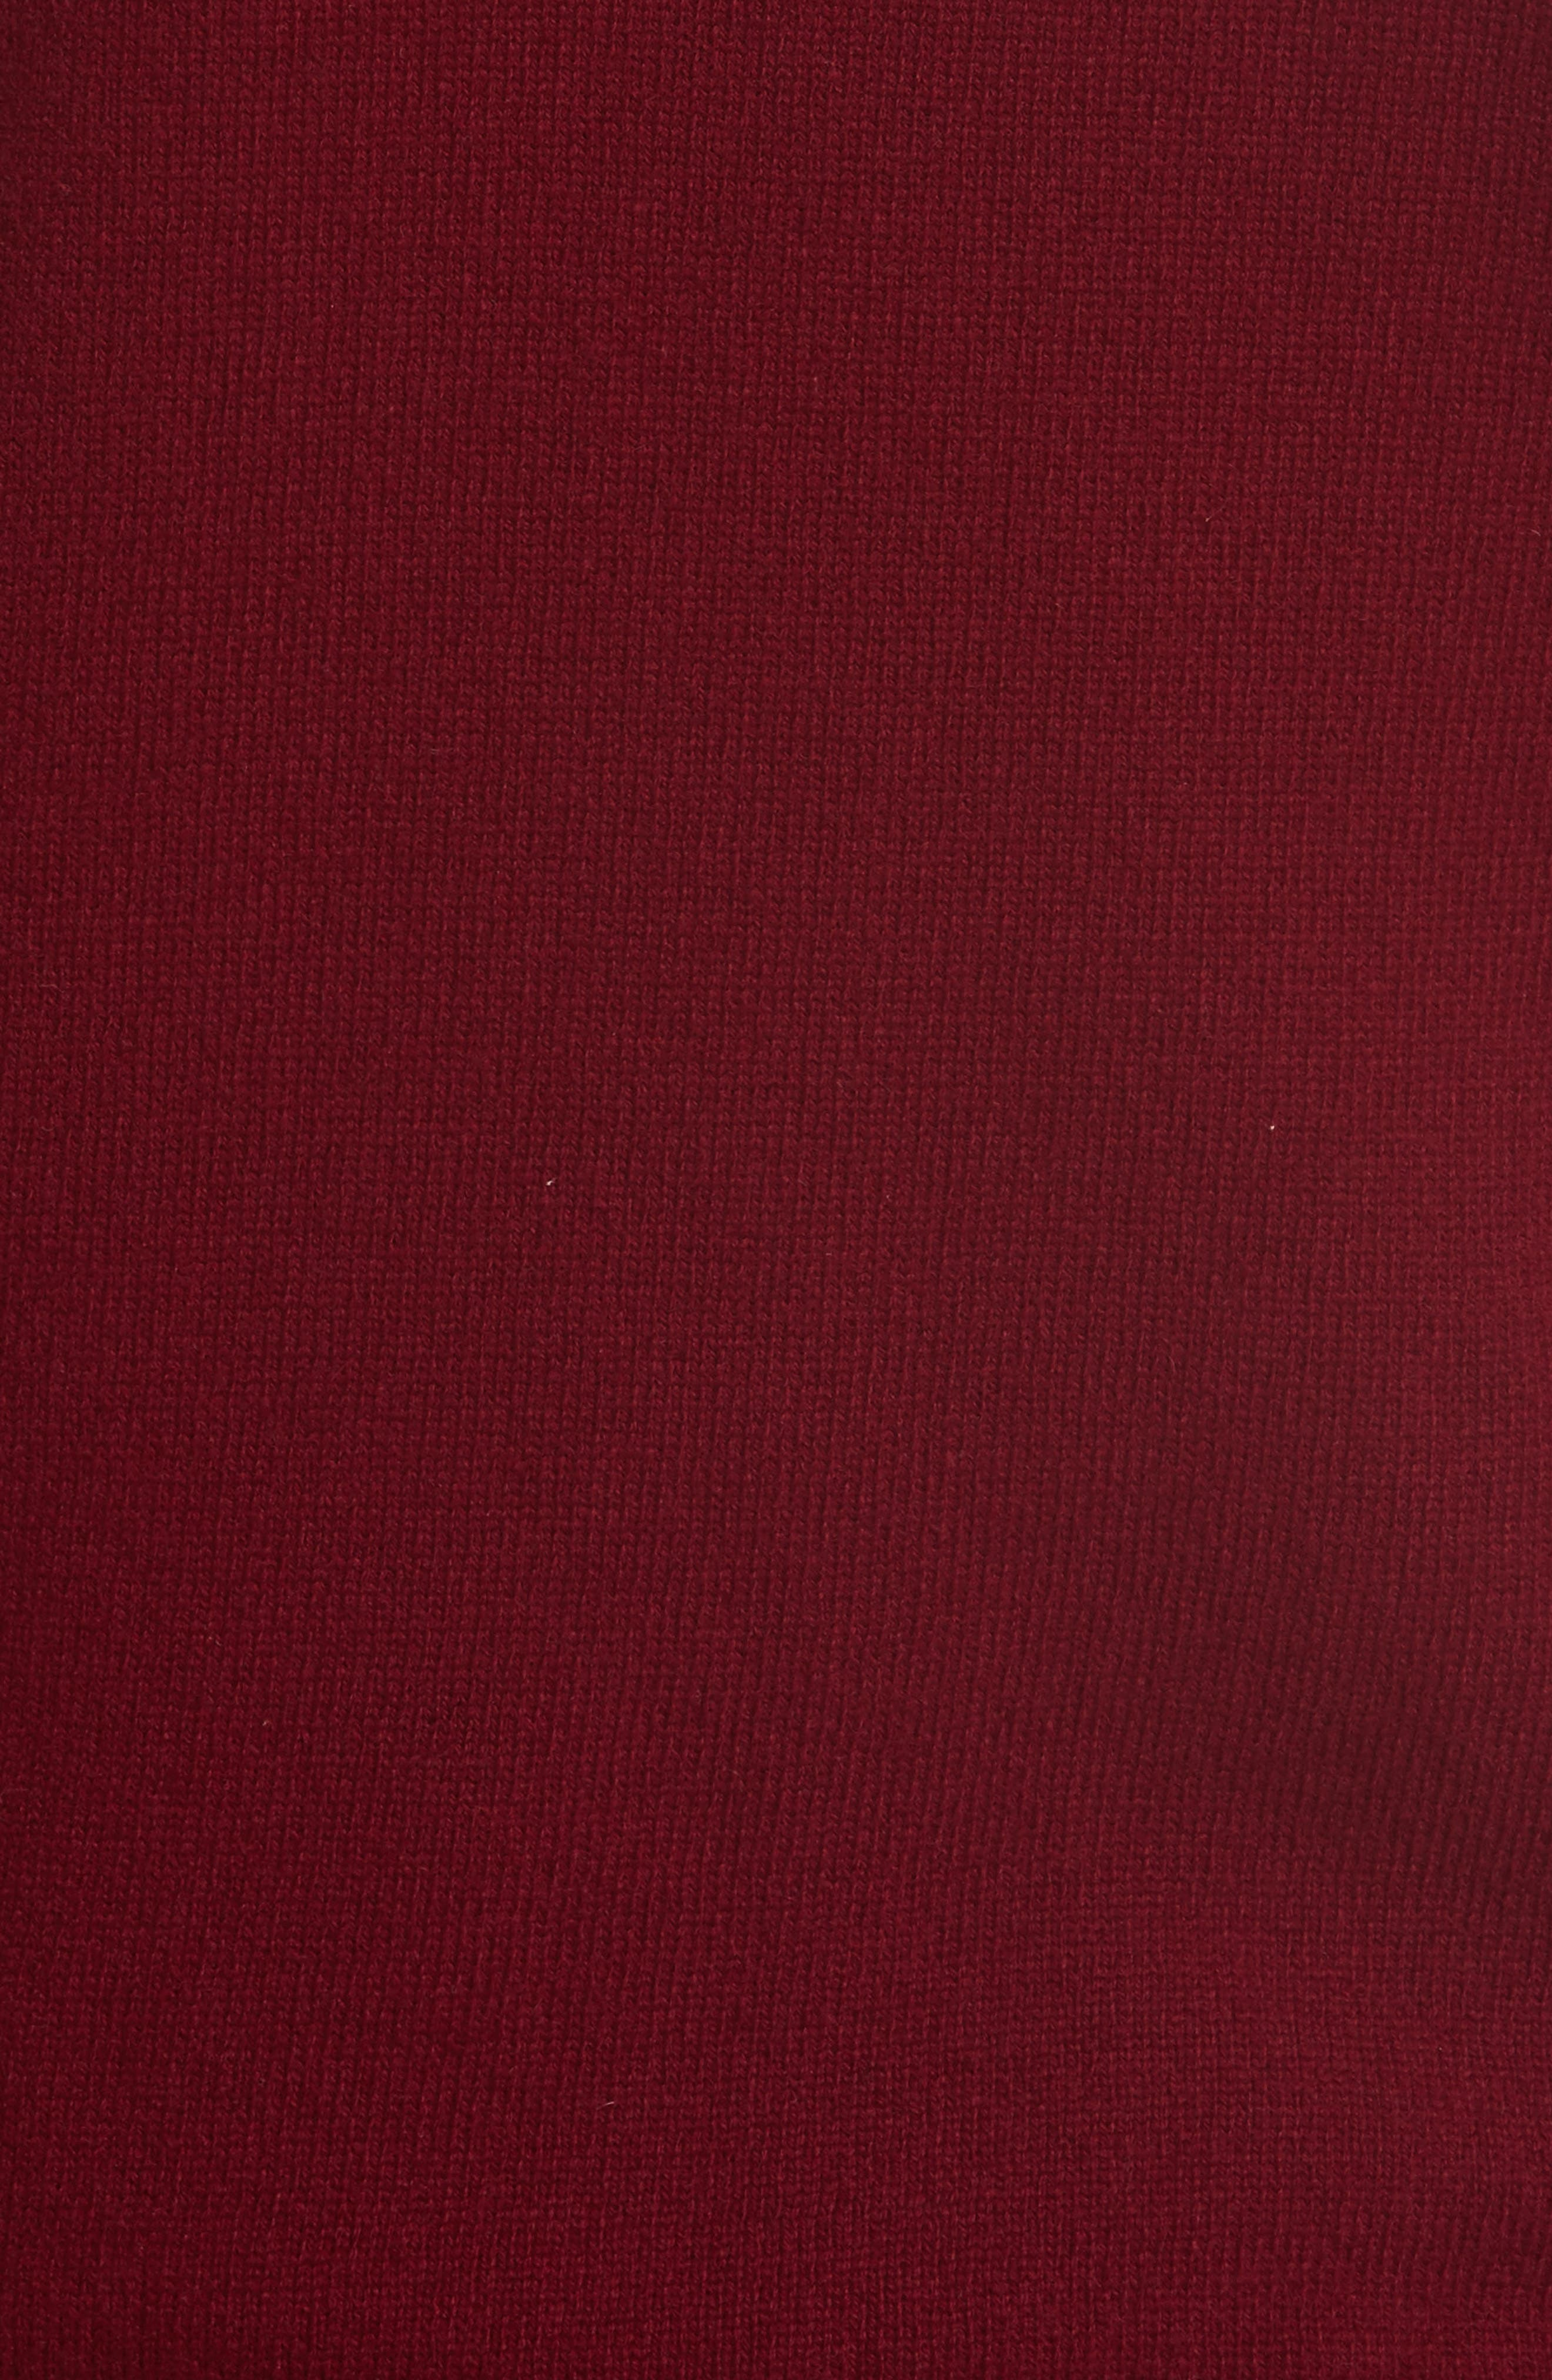 Comme des Garçons PLAY Wool Cardigan,                             Alternate thumbnail 5, color,                             Burgundy